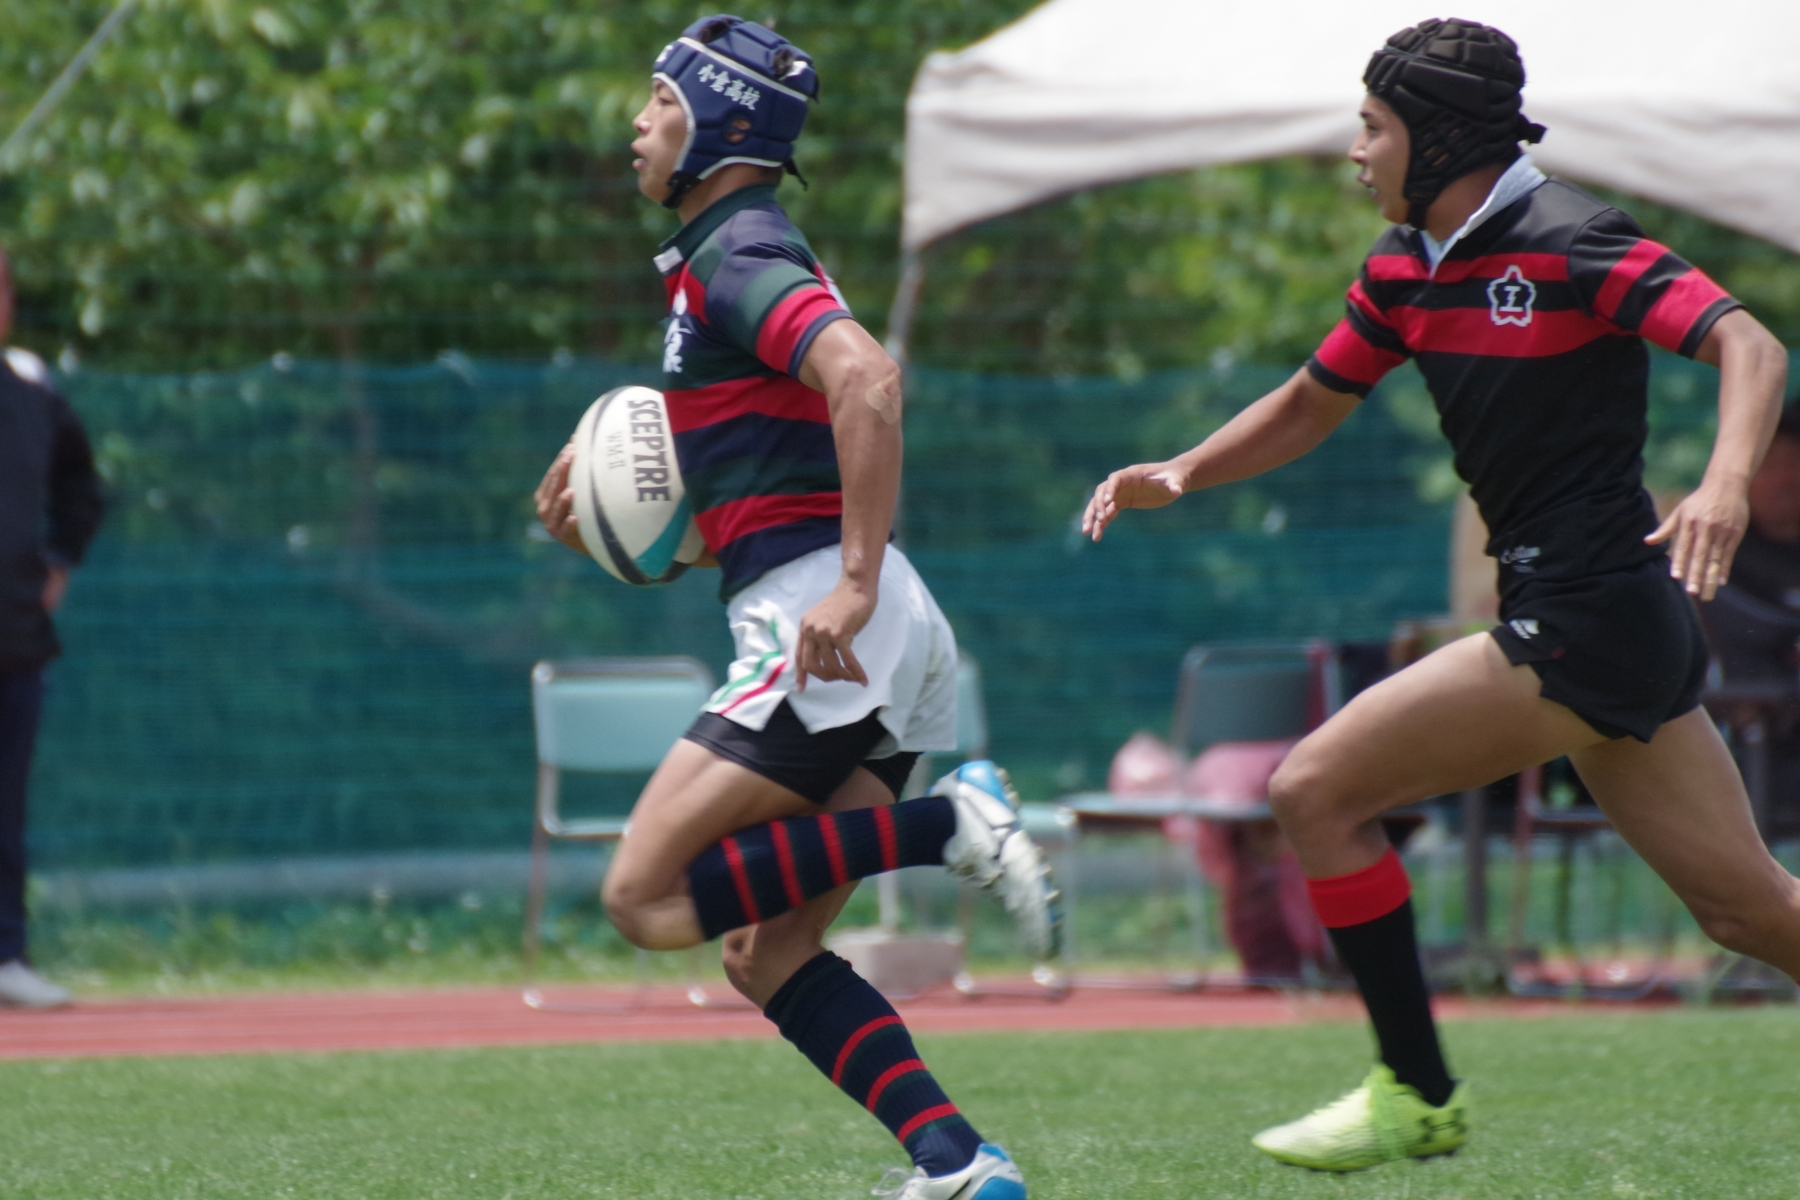 http://kokura-rugby.sakura.ne.jp/180520_123624_0269.jpg